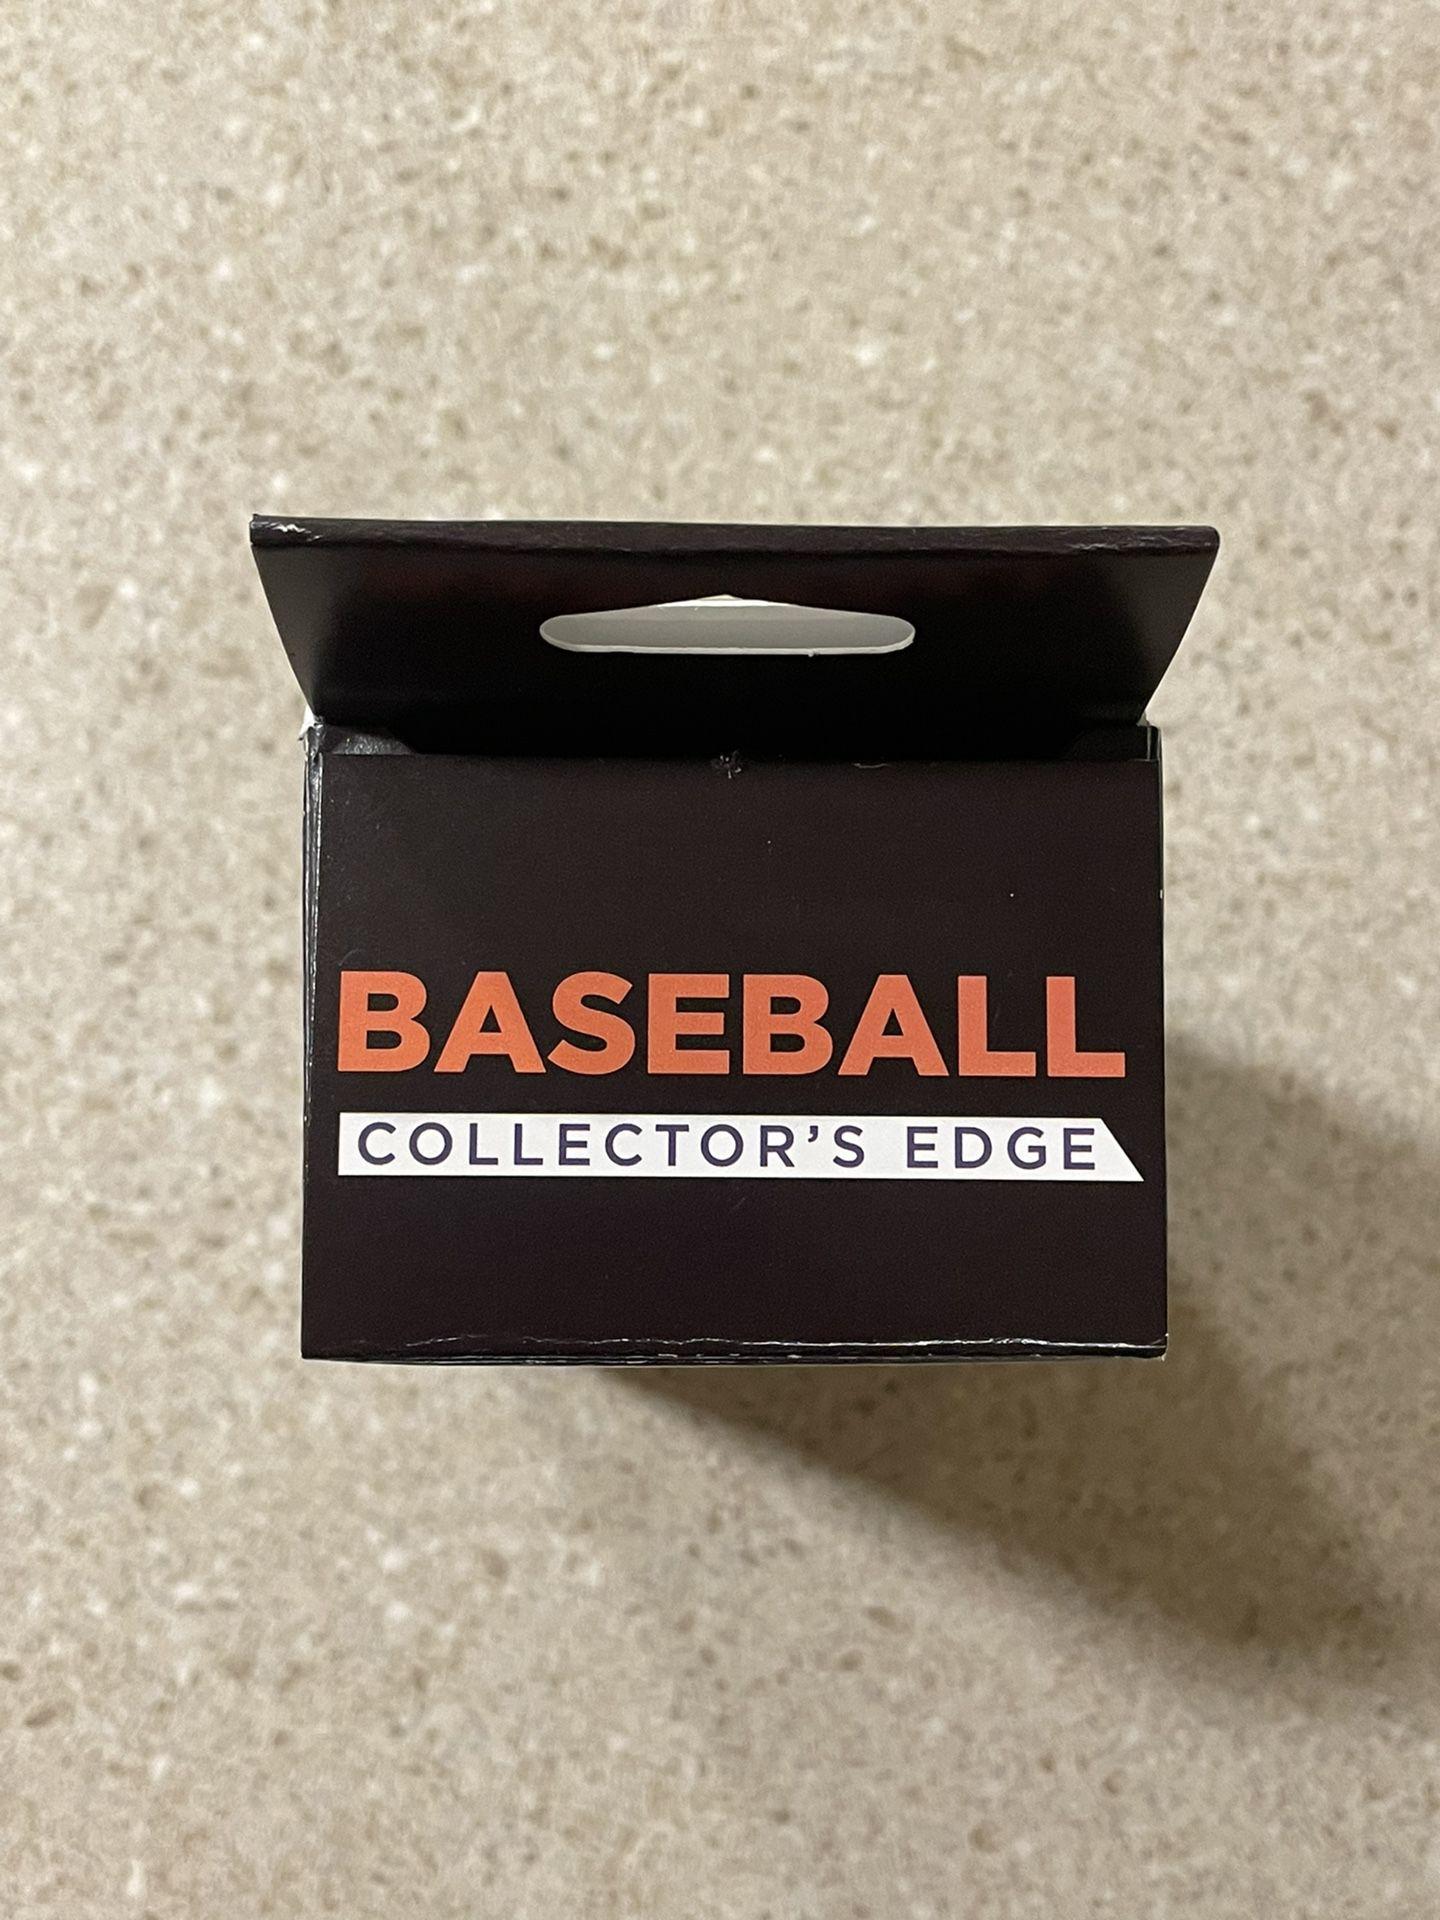 Fairfield Baseball Collector's Edge Jumbo Boxes